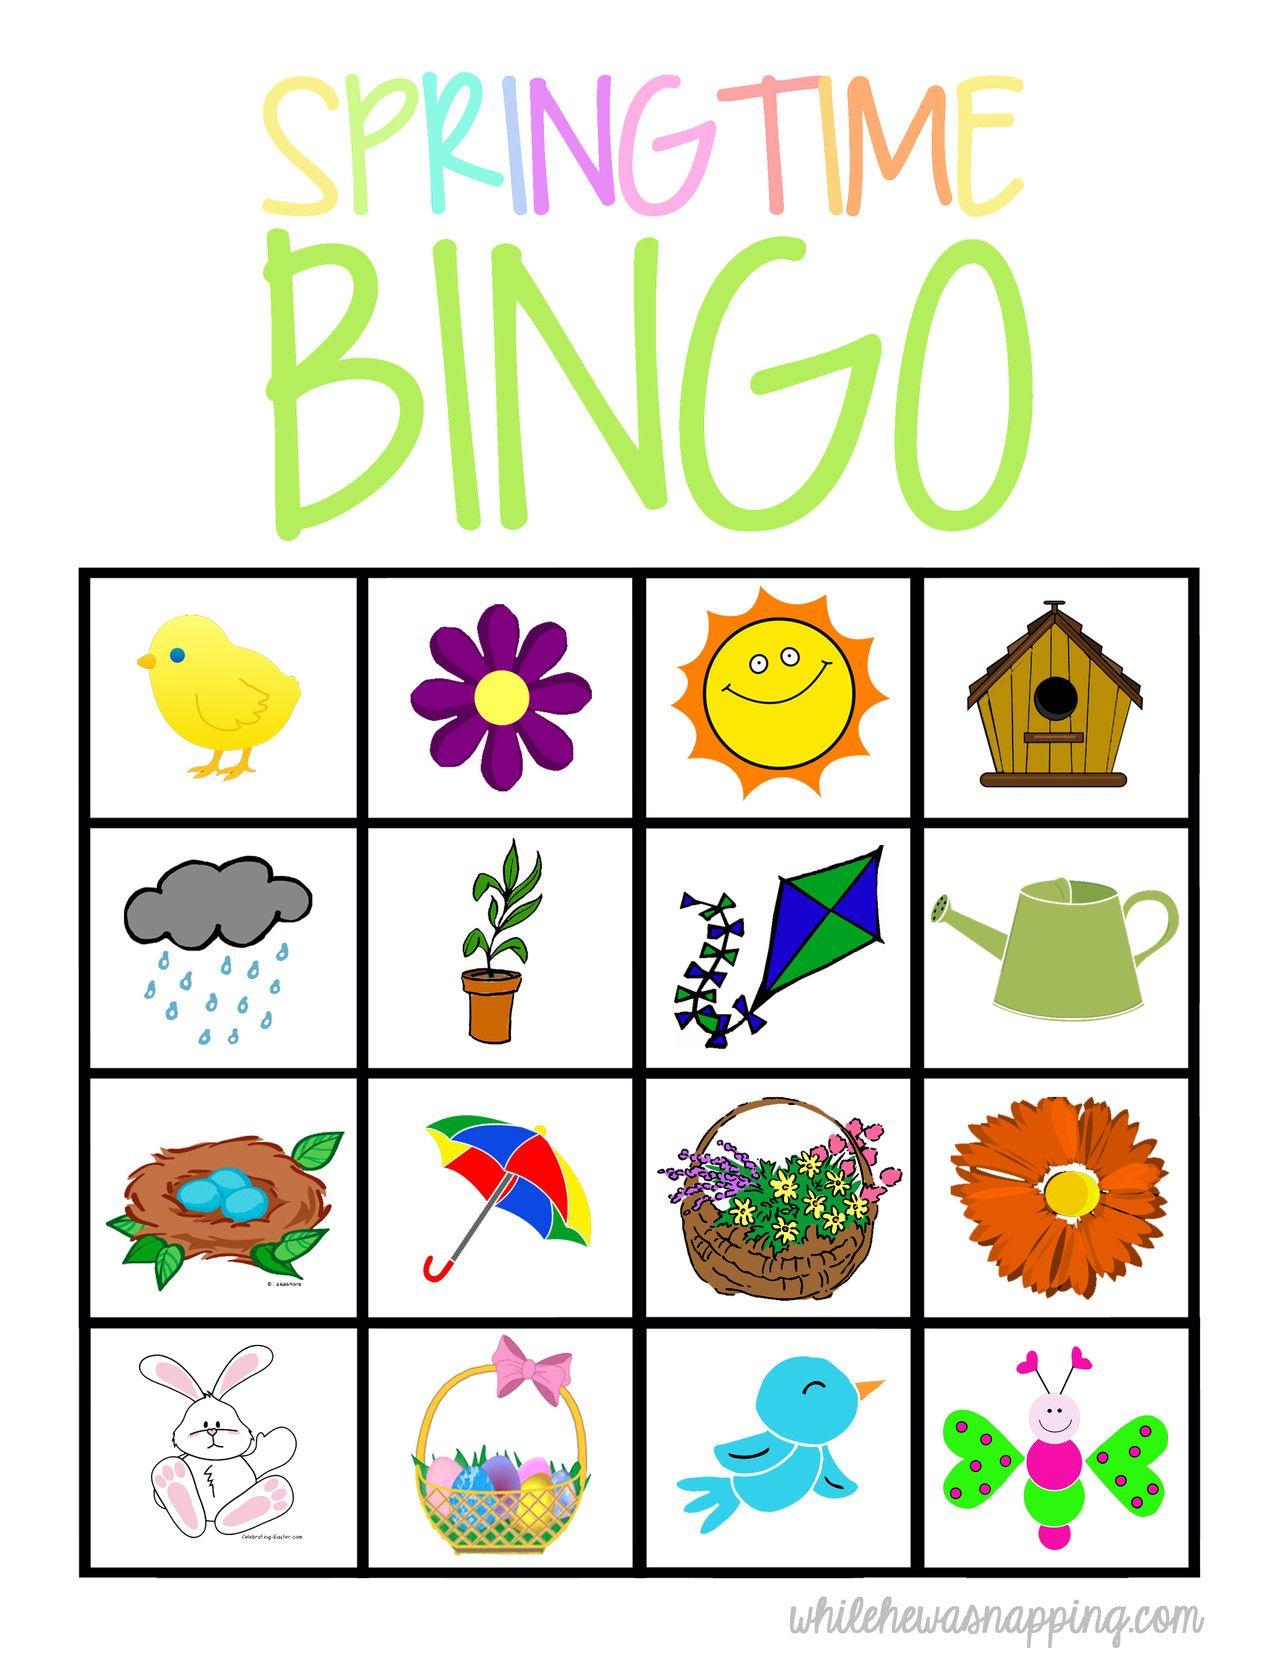 Springtime Bingo Game Printable